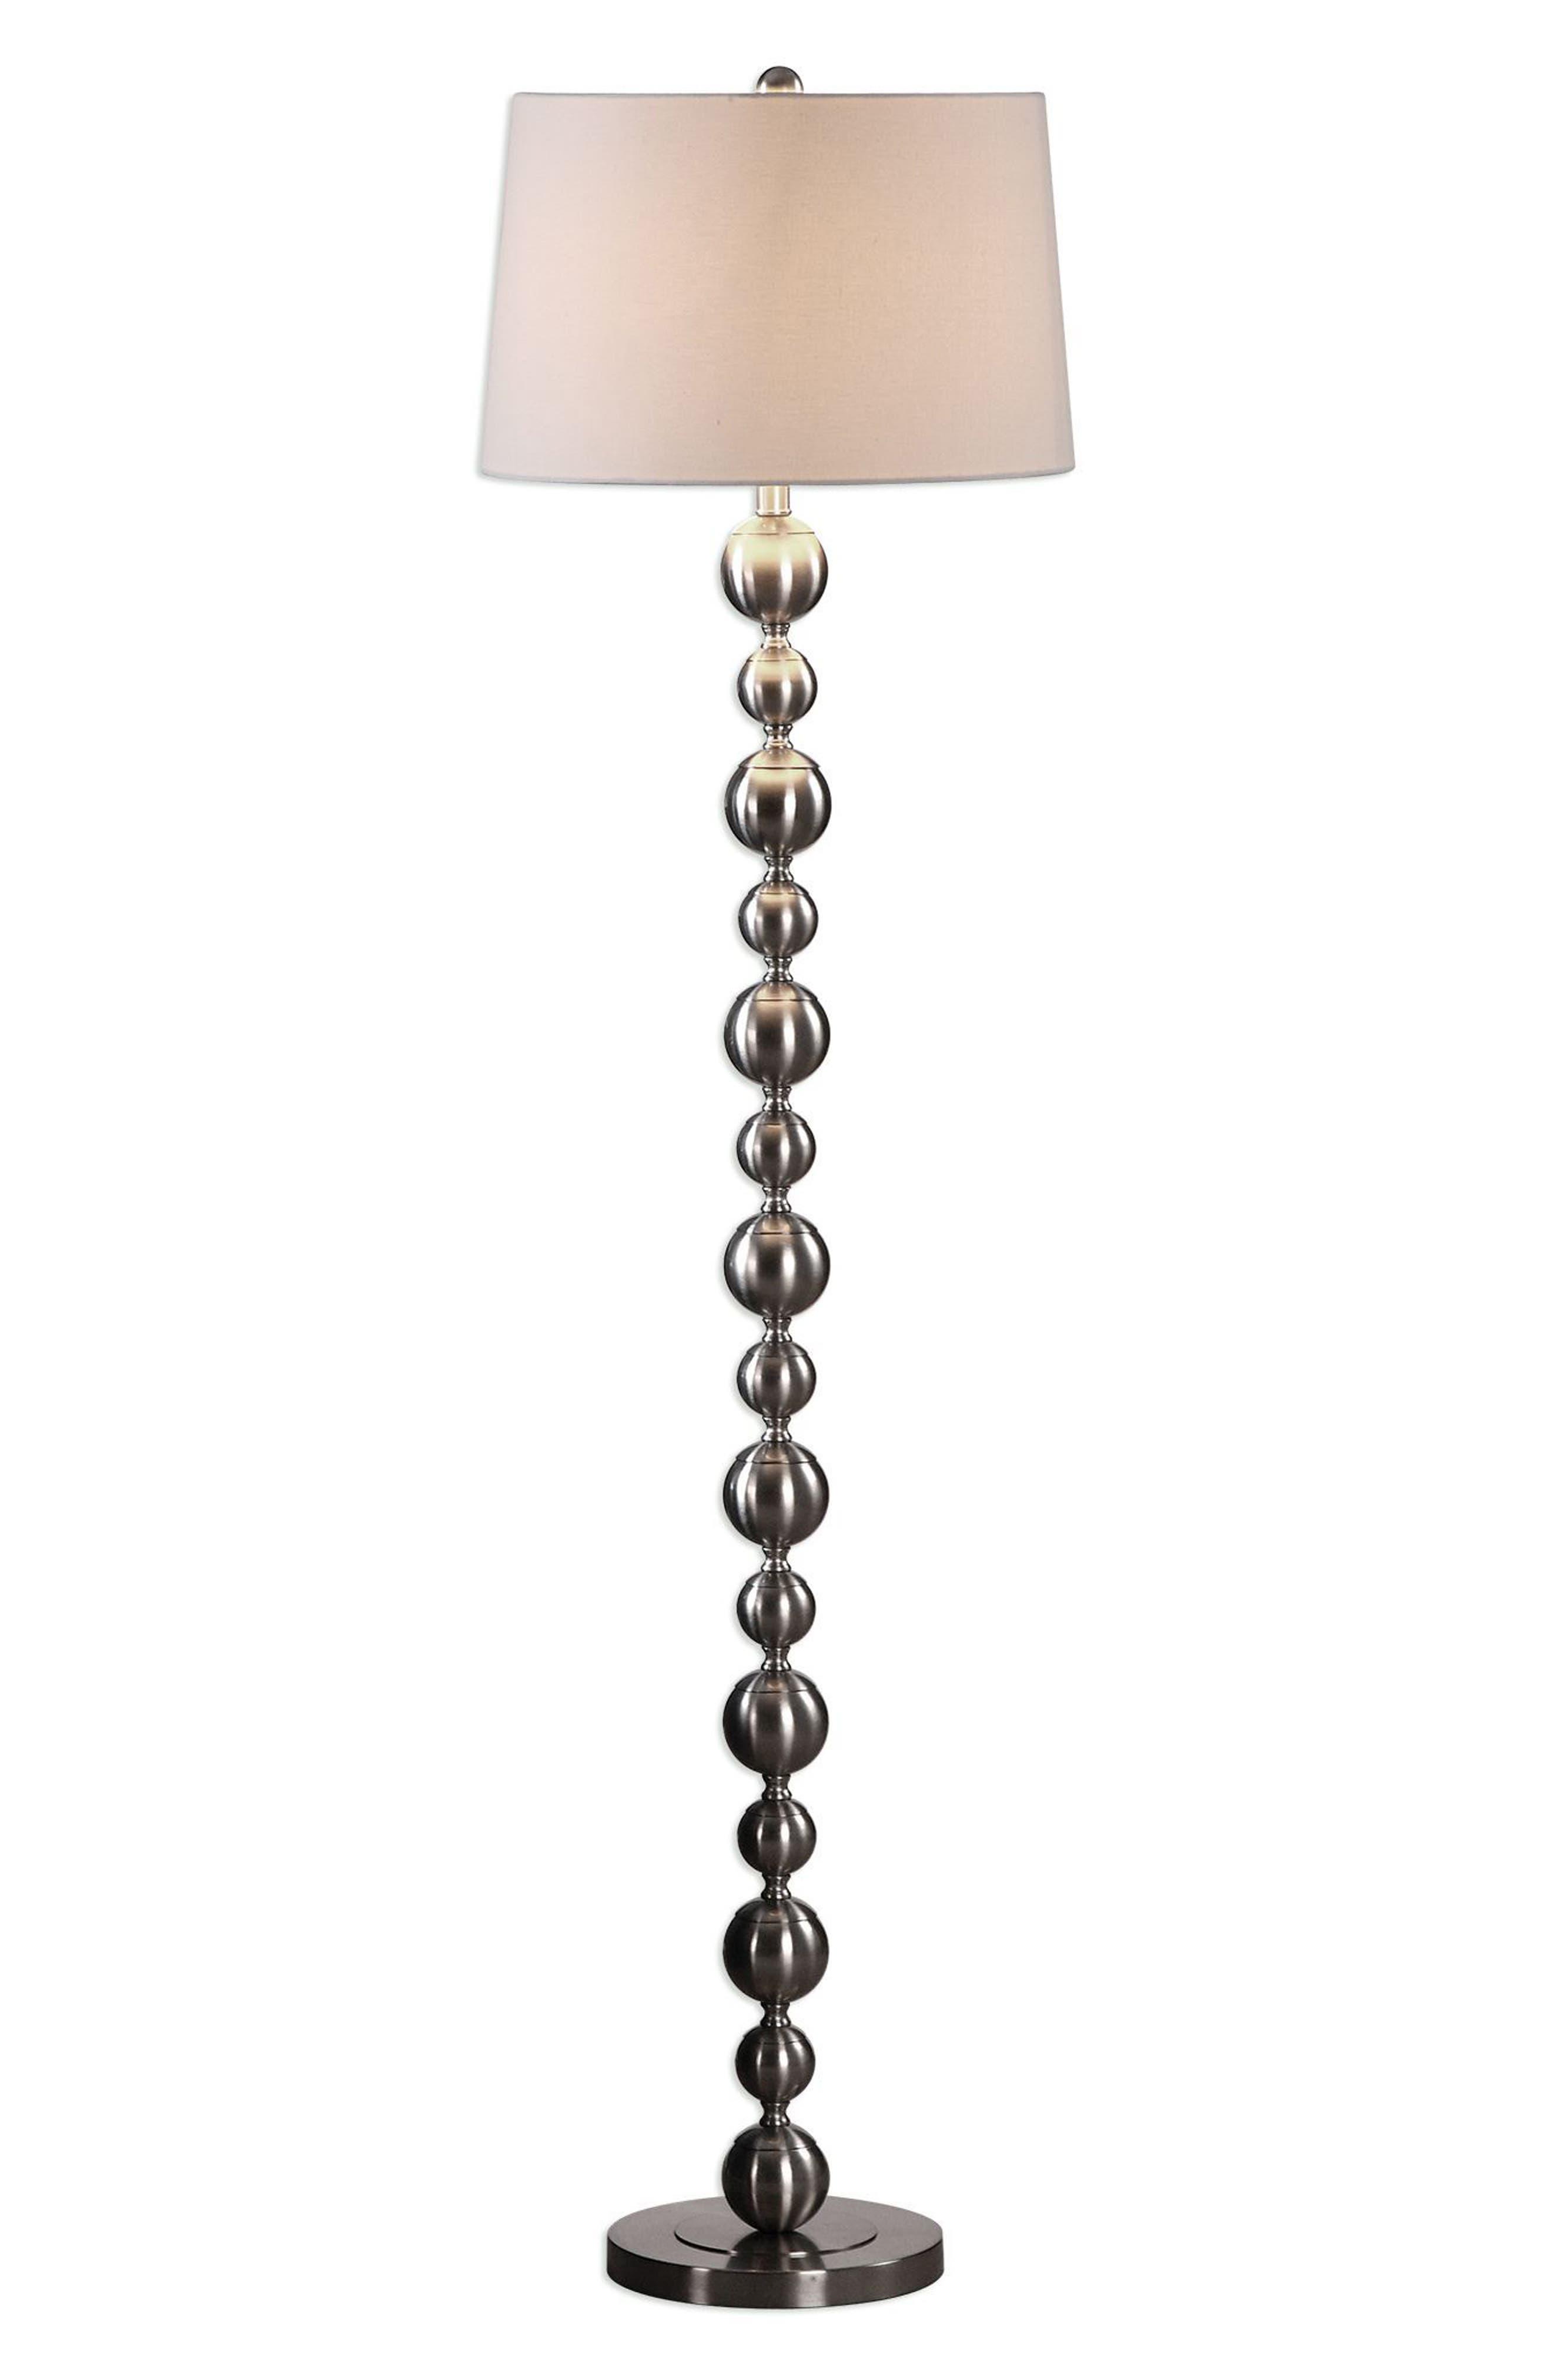 Eloisa Floor Lamp,                             Main thumbnail 1, color,                             200